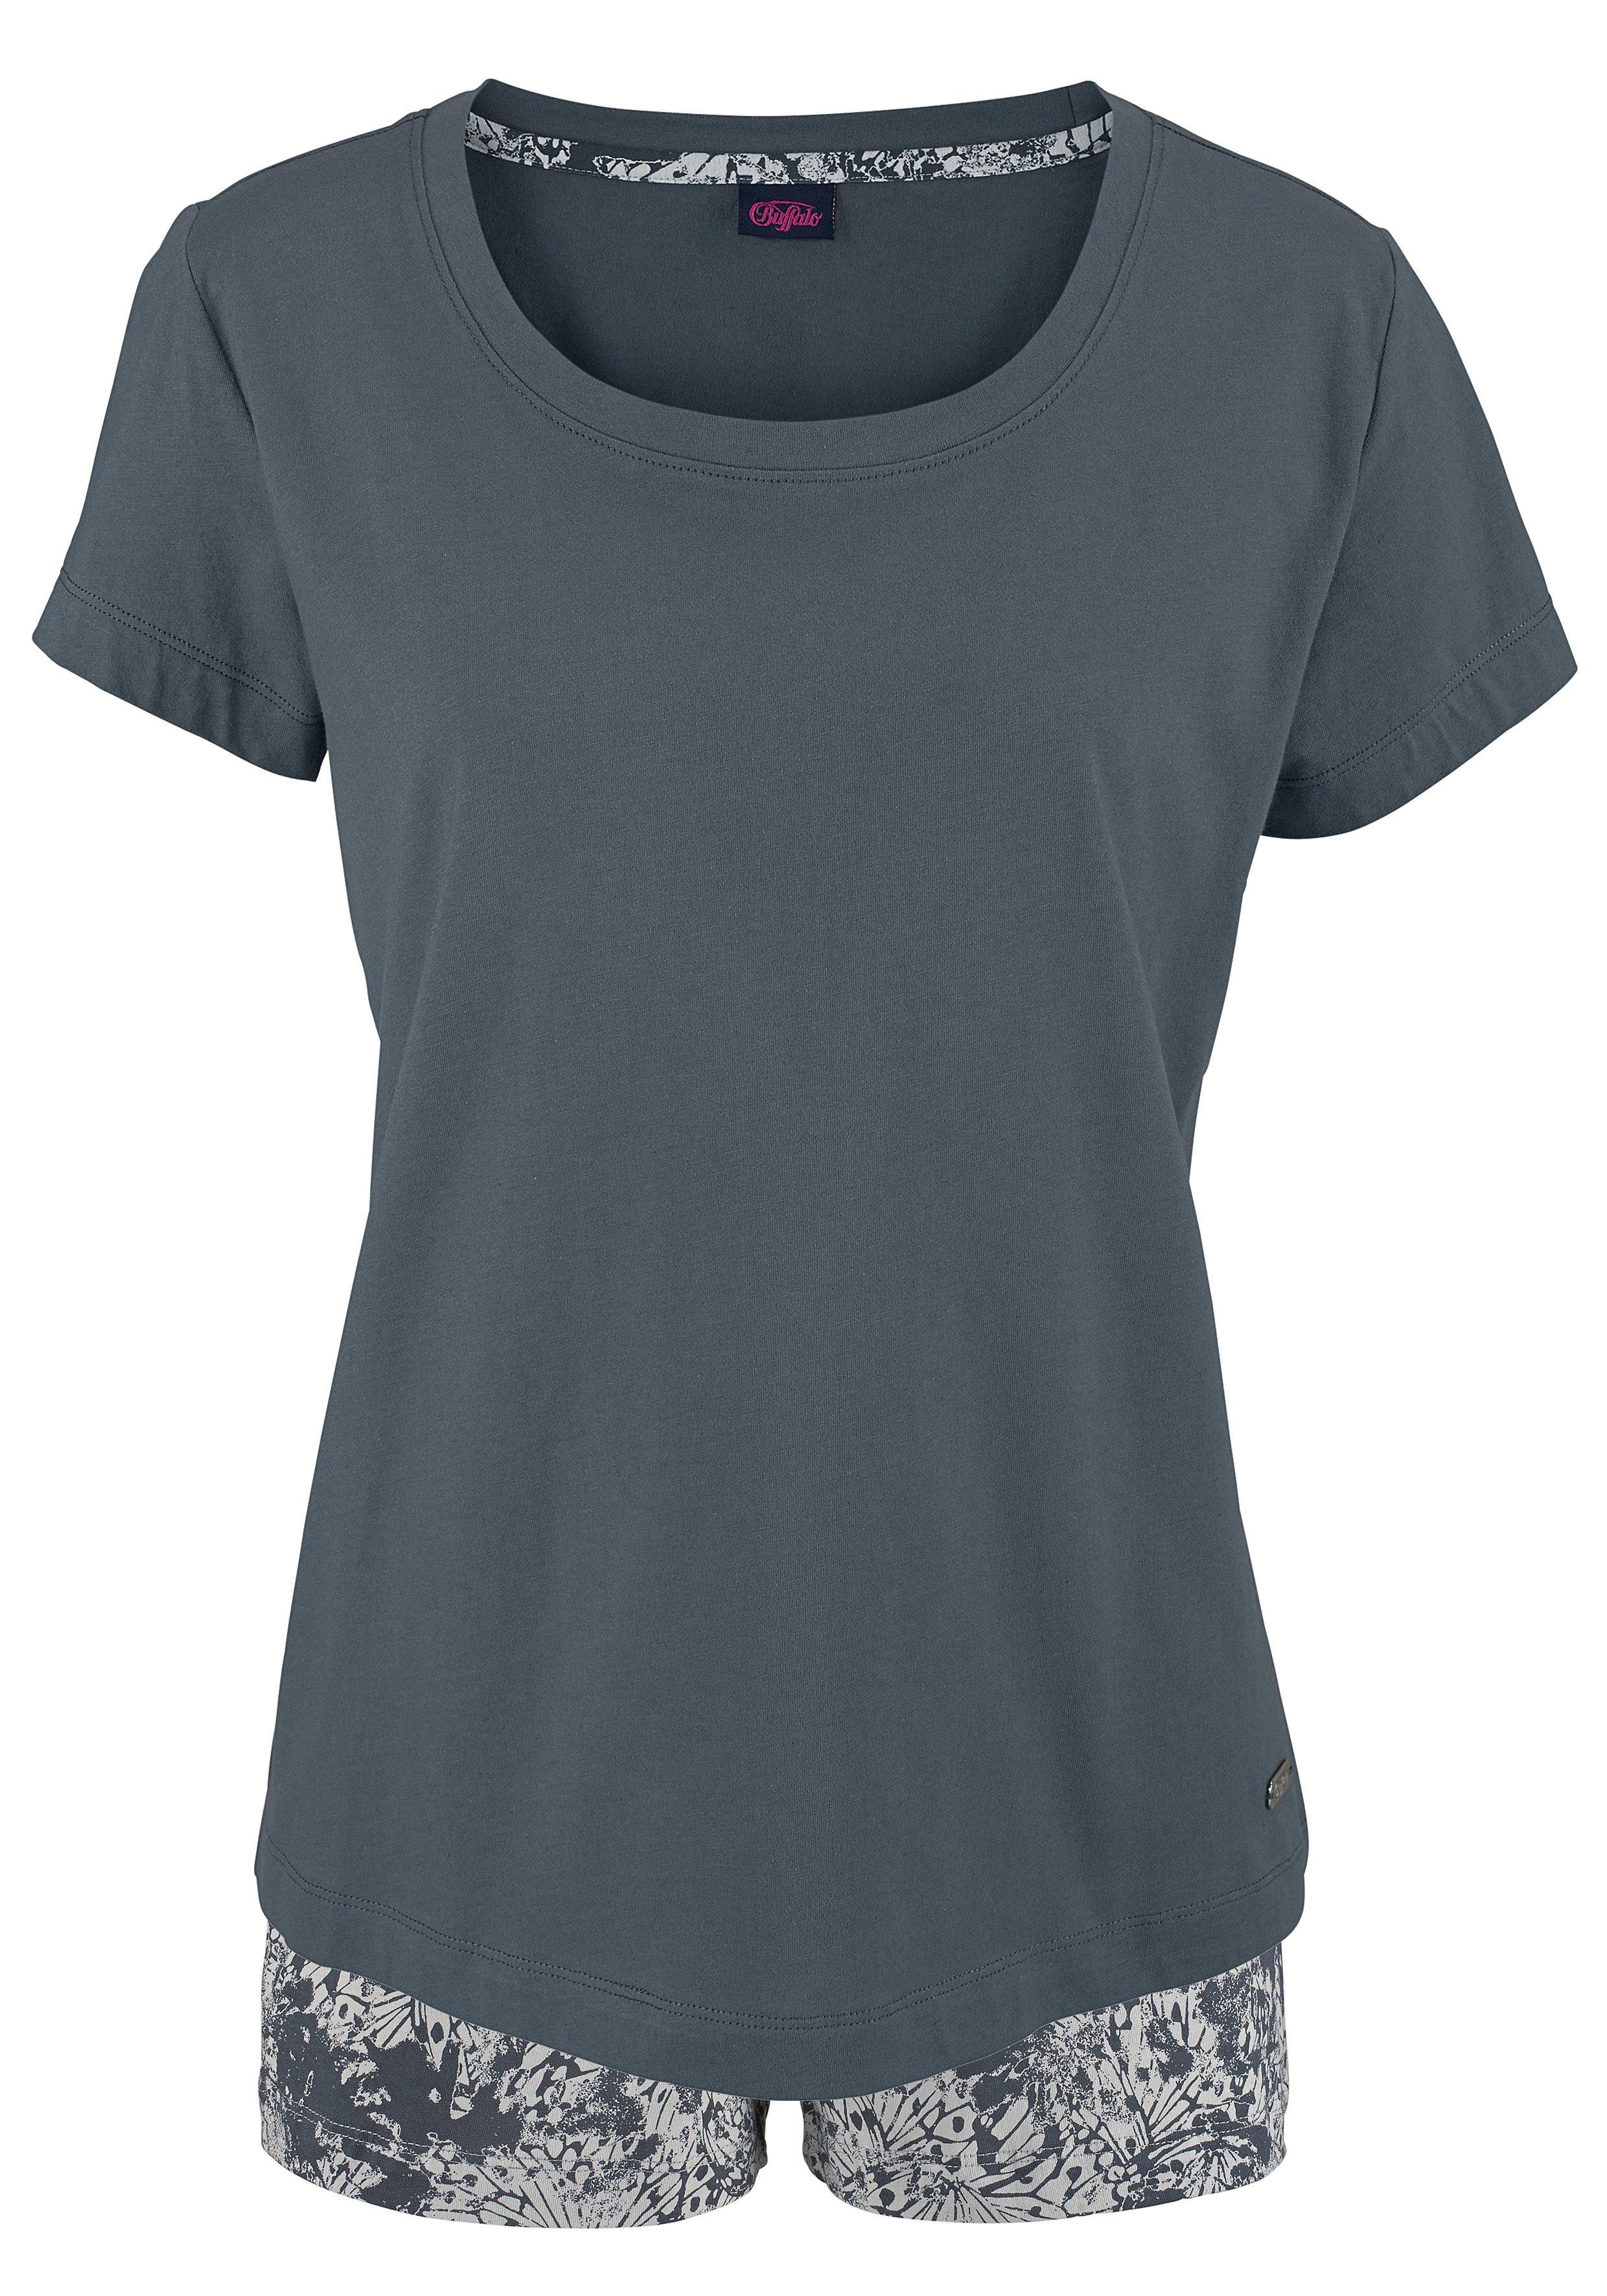 Buffalo Shorty mit gemusterter Shorts & softem Basic T-Shirt